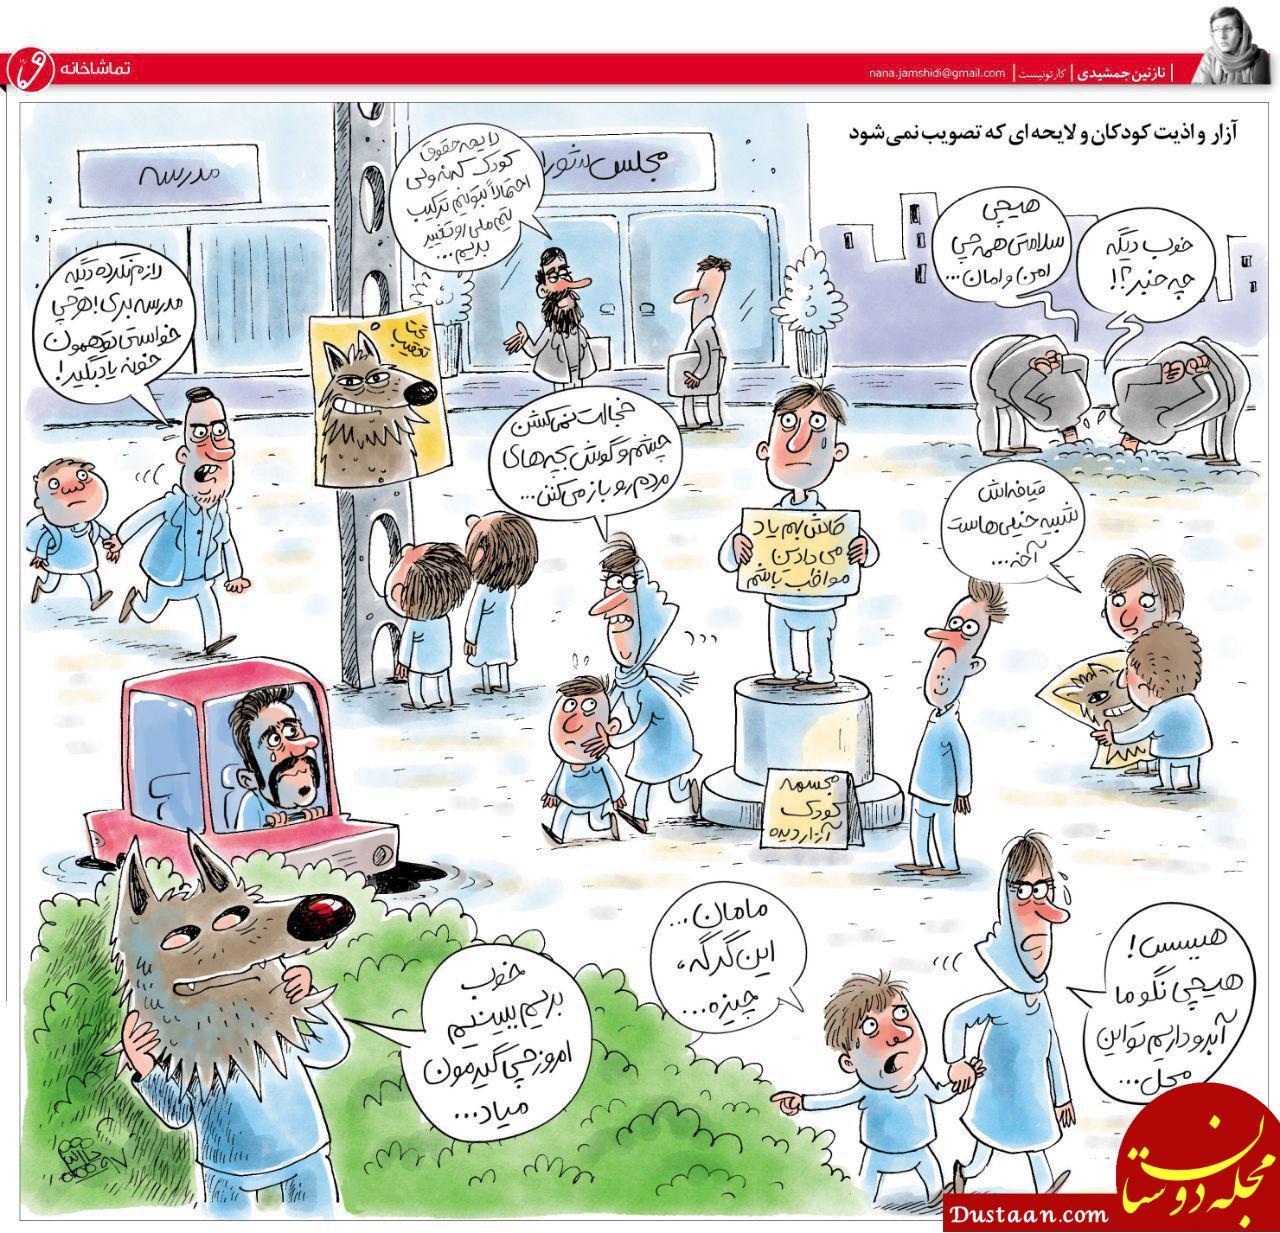 www.dustaan.com آزار و اذیت کودکان و لایحه ای که تصویب نمی شود +عکس